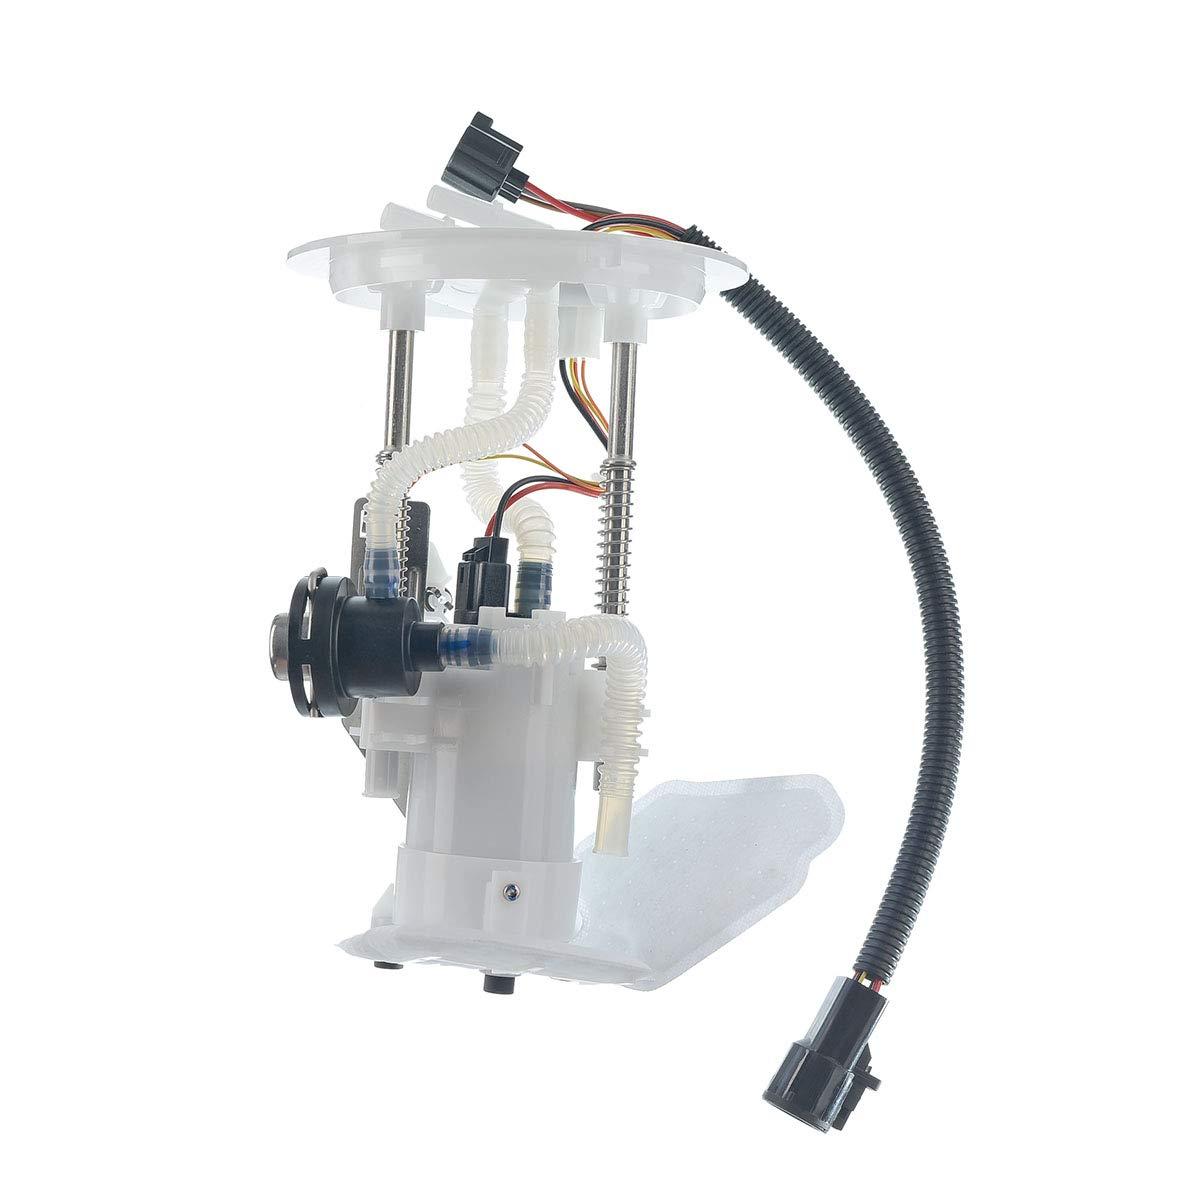 E2334M Fuel Pump Module Assembly For 2002-2003 Ford Explorer V6-4.0L Vin E Gas